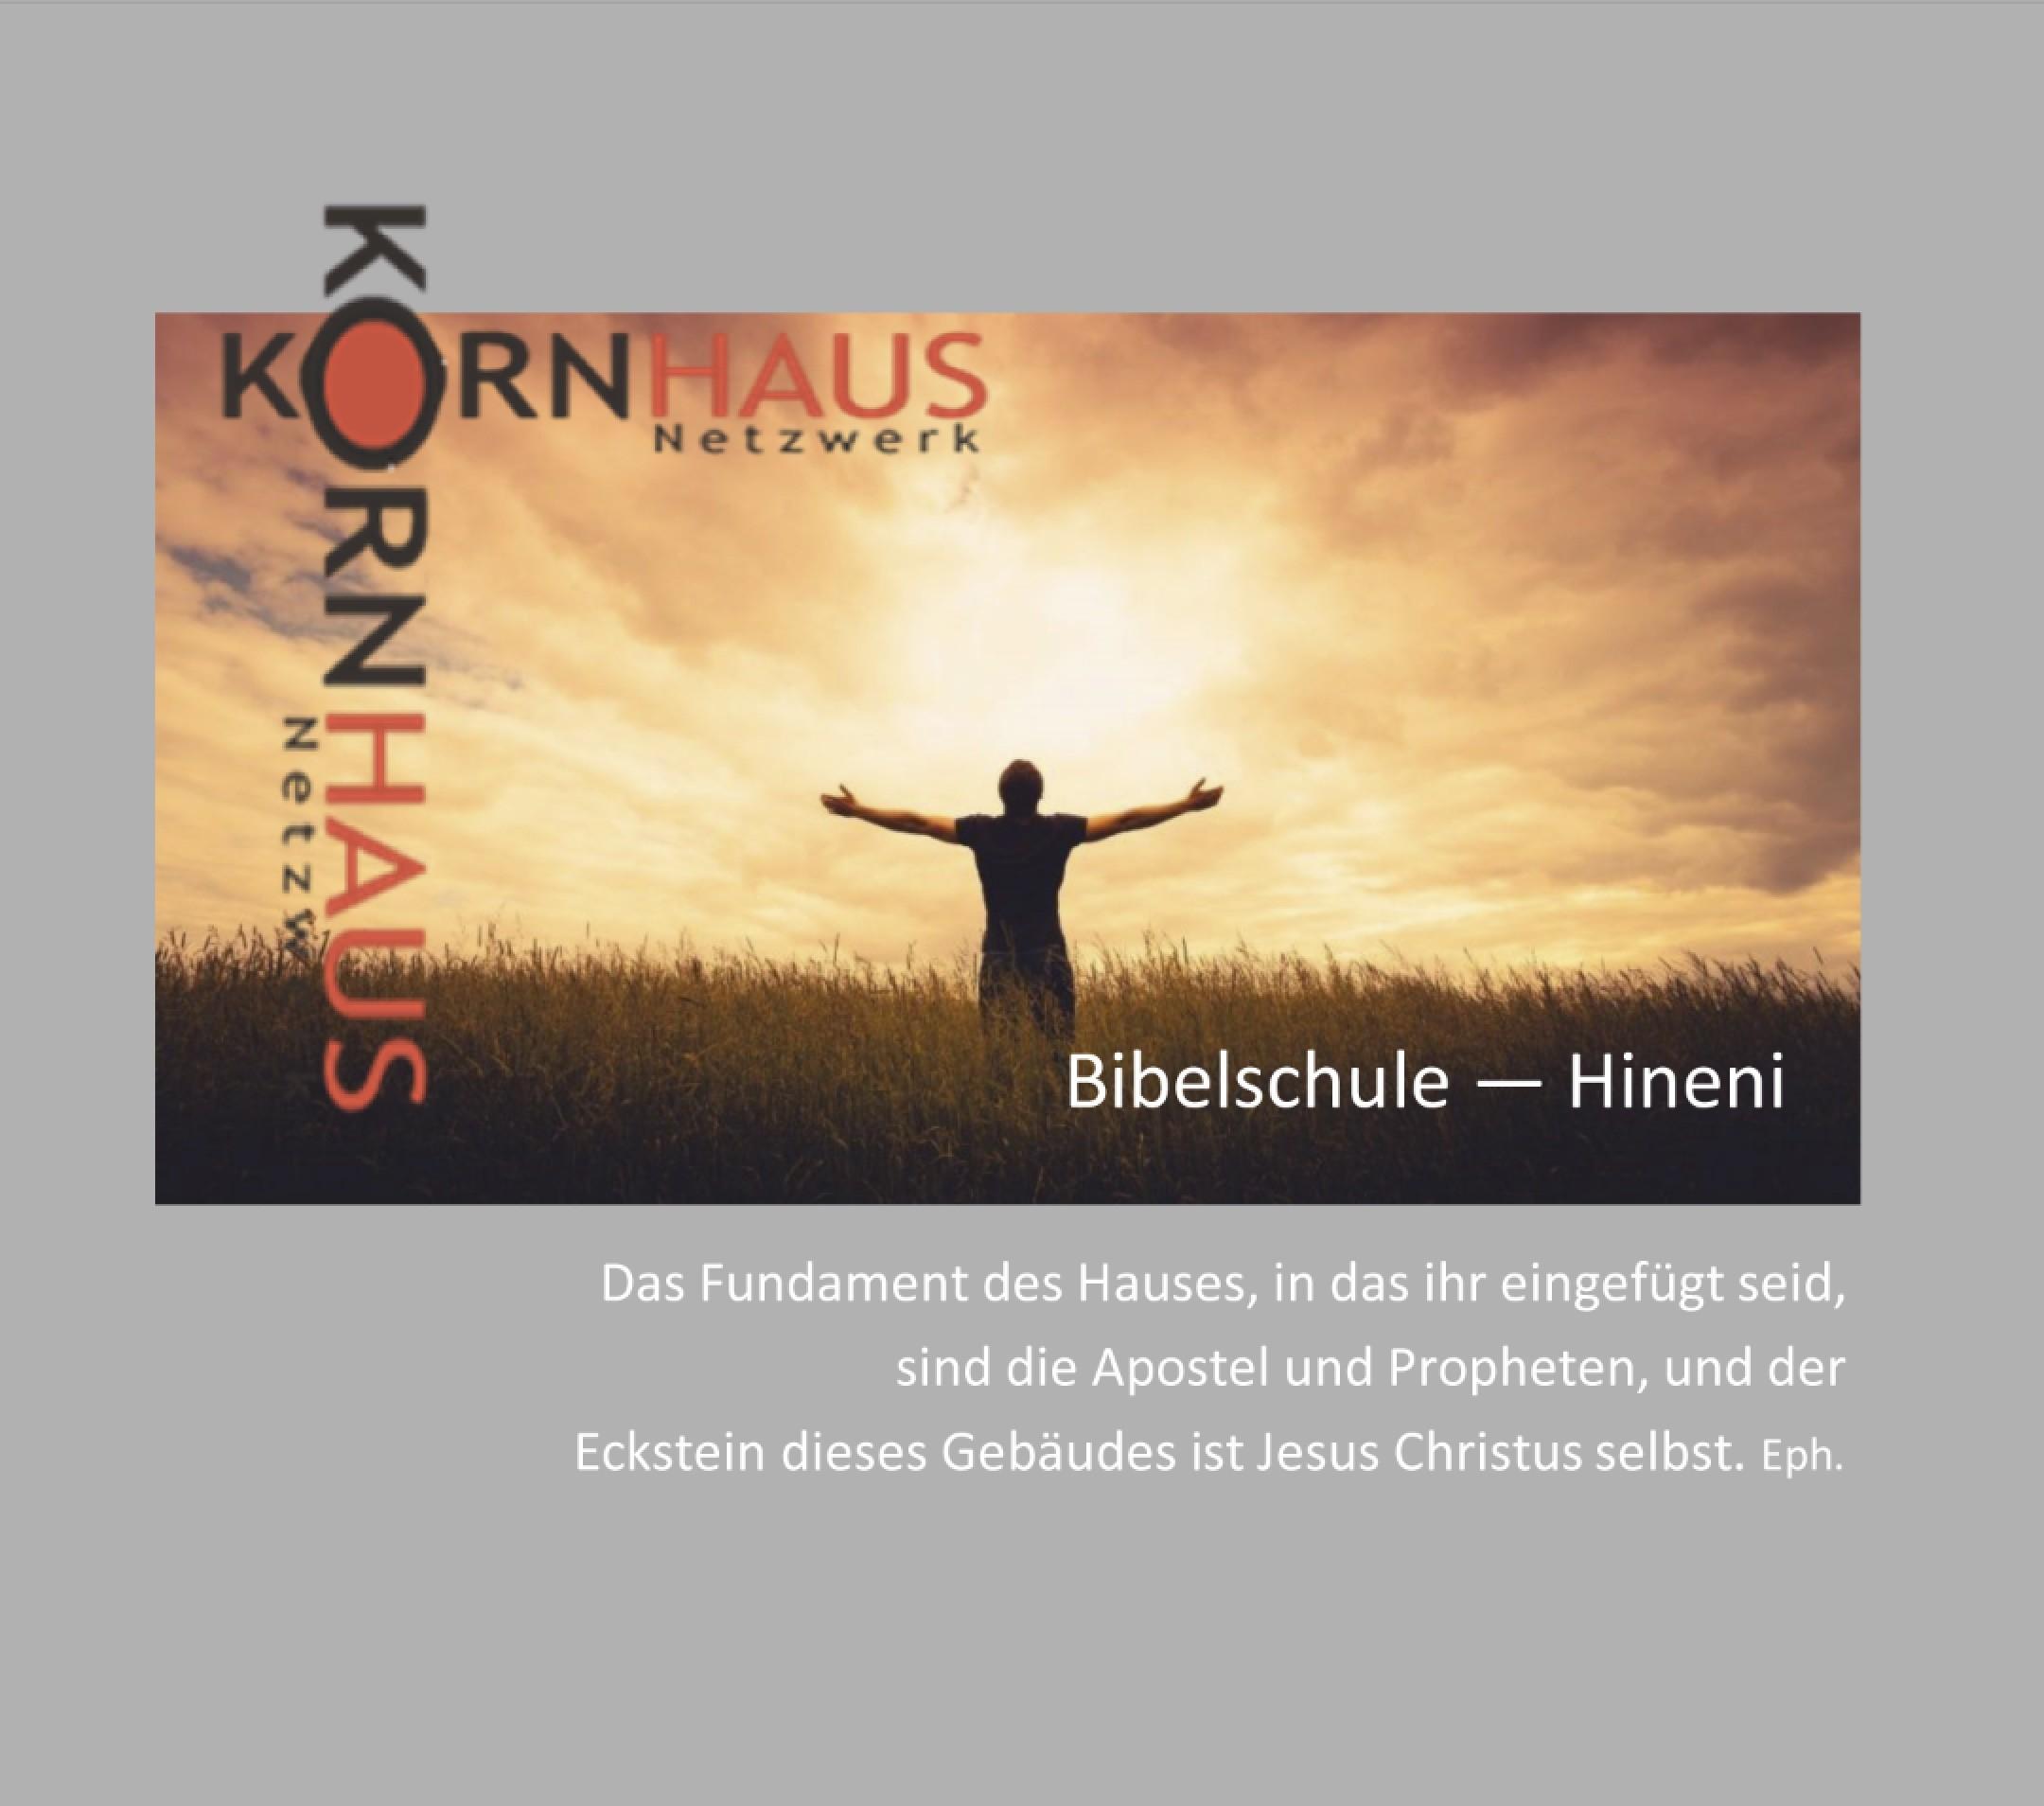 Kornhaus Bibelschule